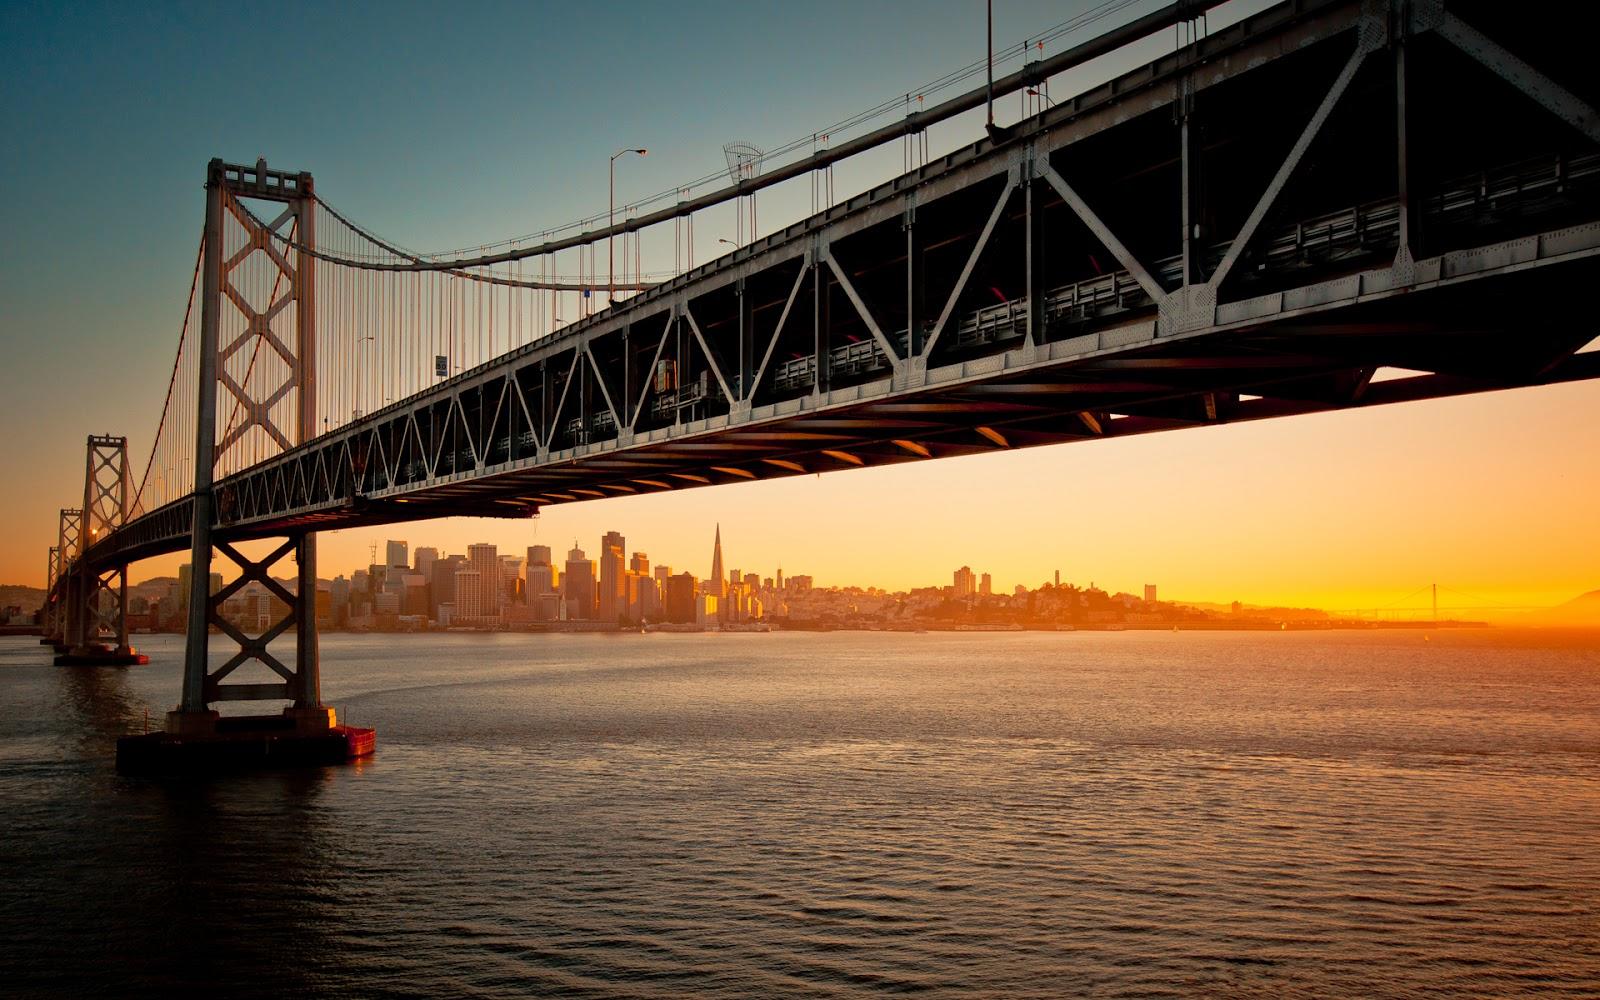 hình cây cầu đẹp